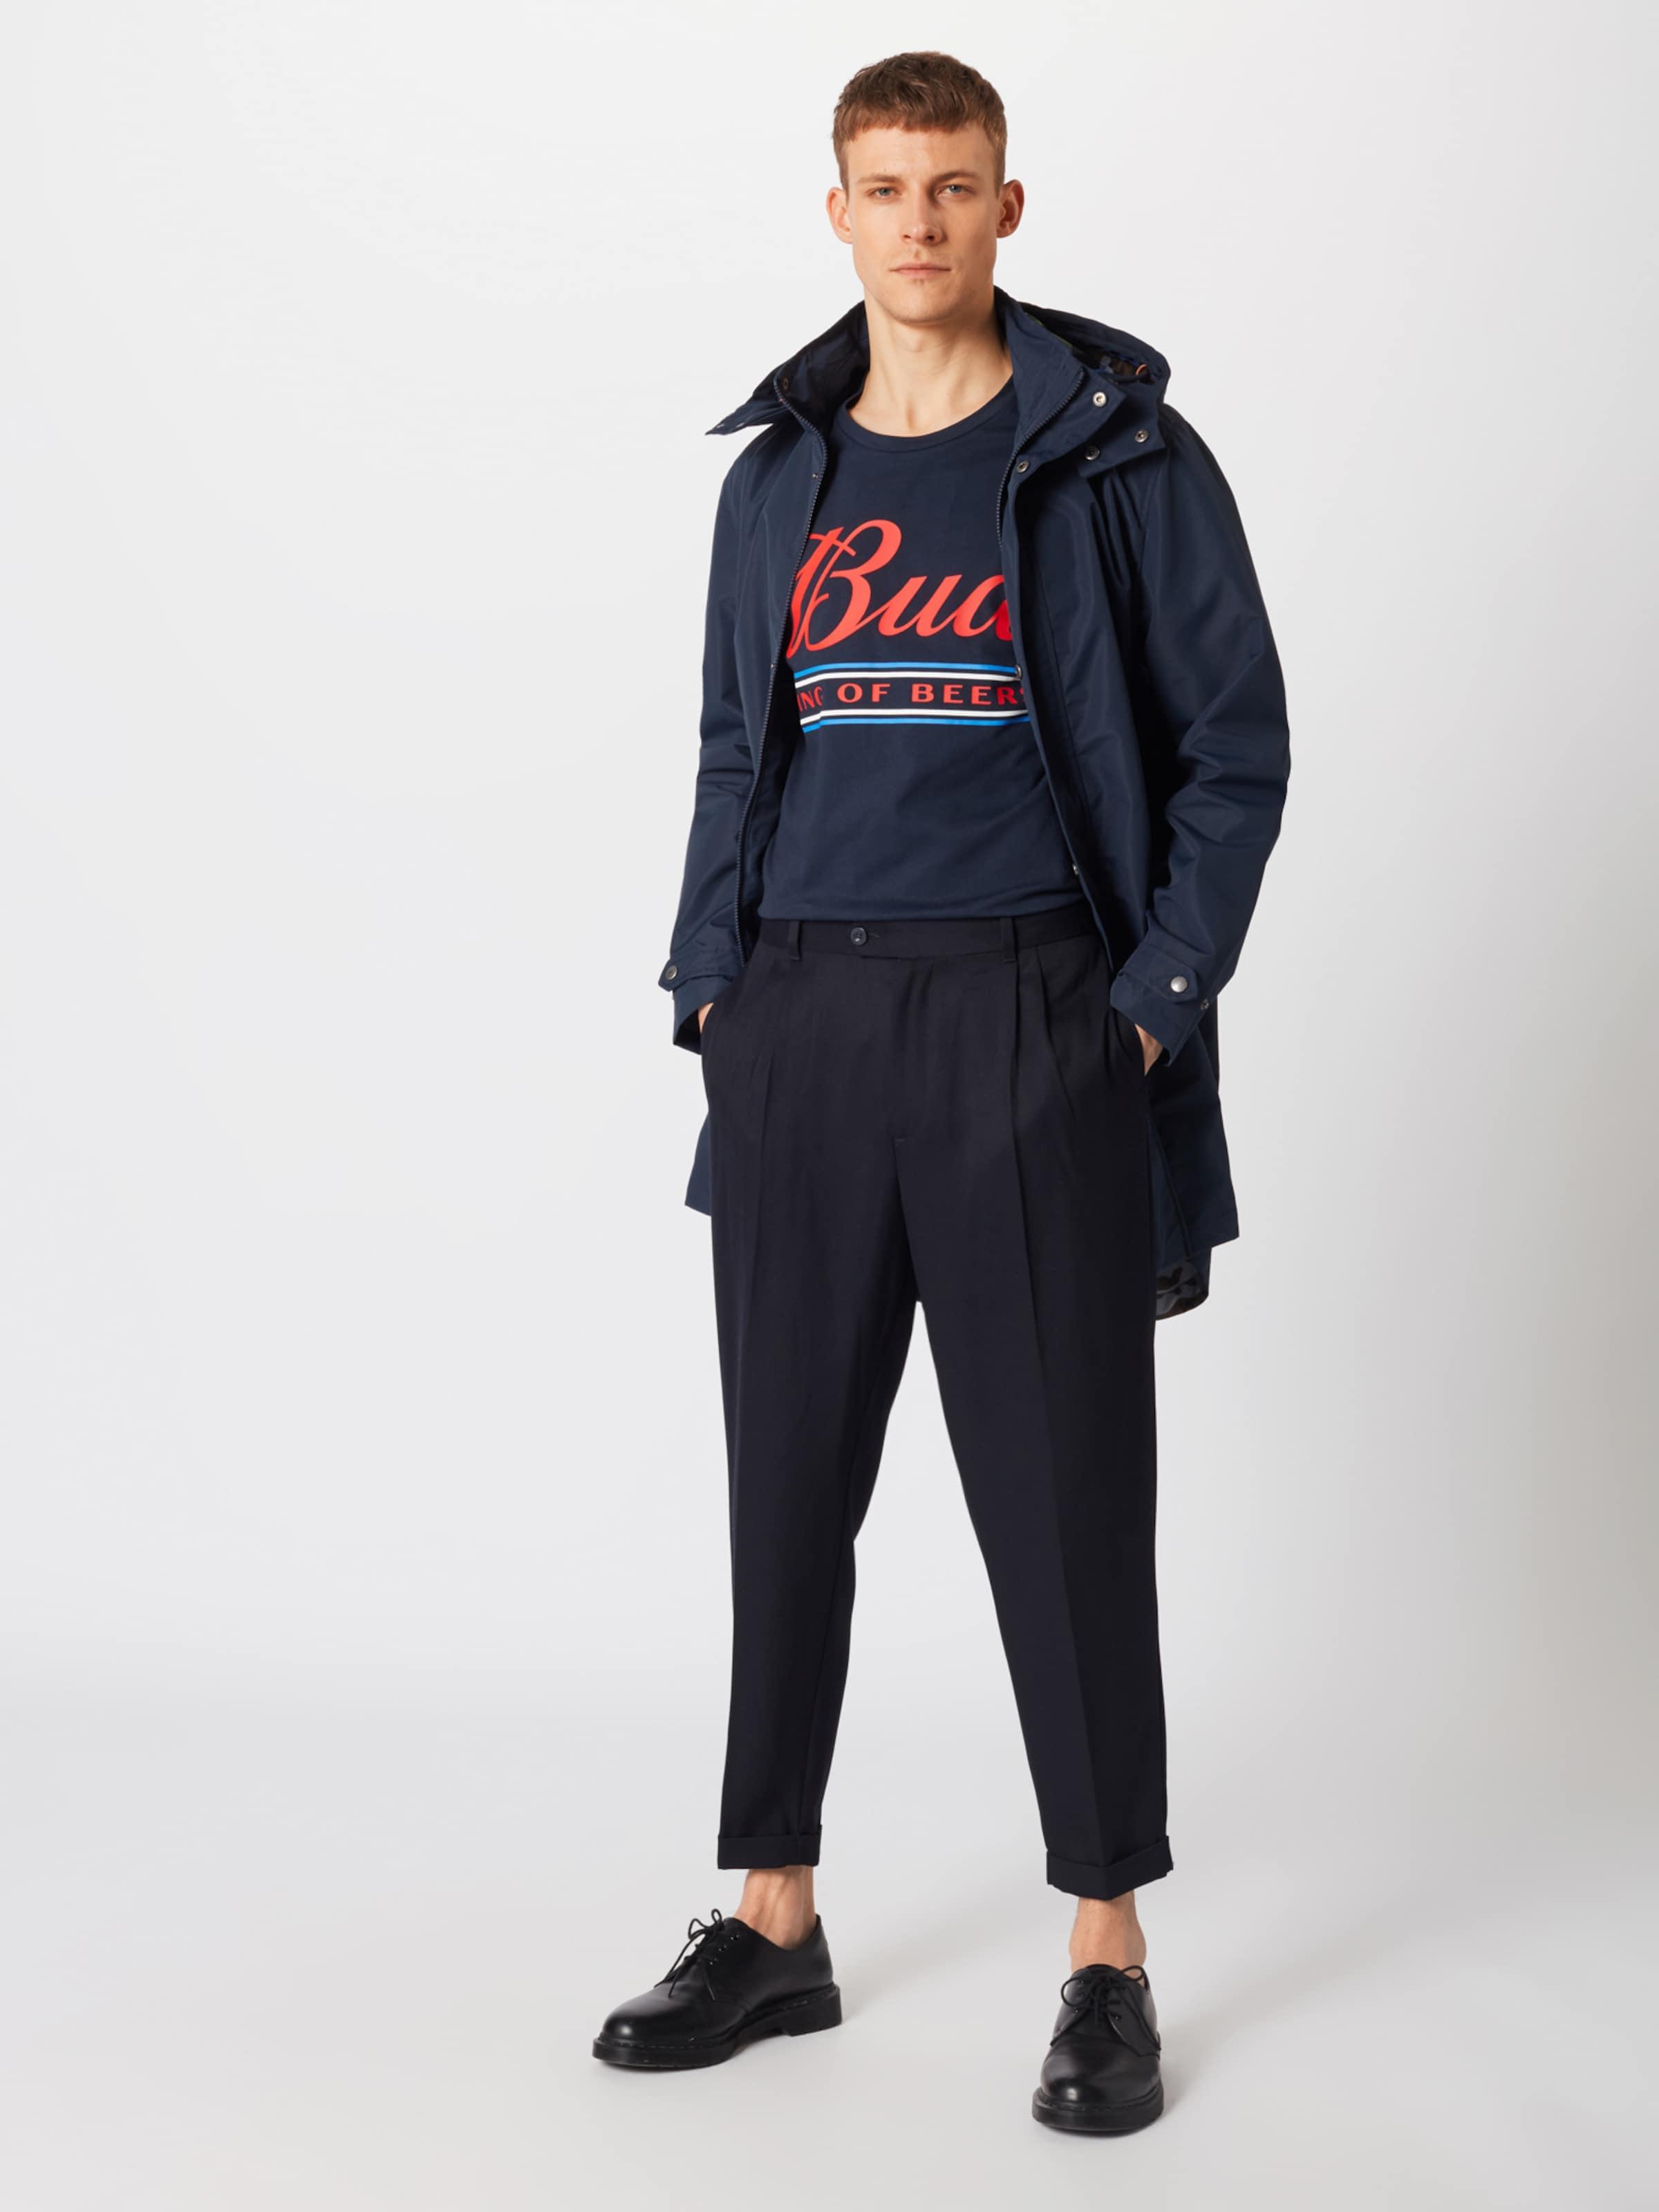 Marine 'tailored Pince Pantalon En Review Pleated' À Bleu SpLzGjqUMV